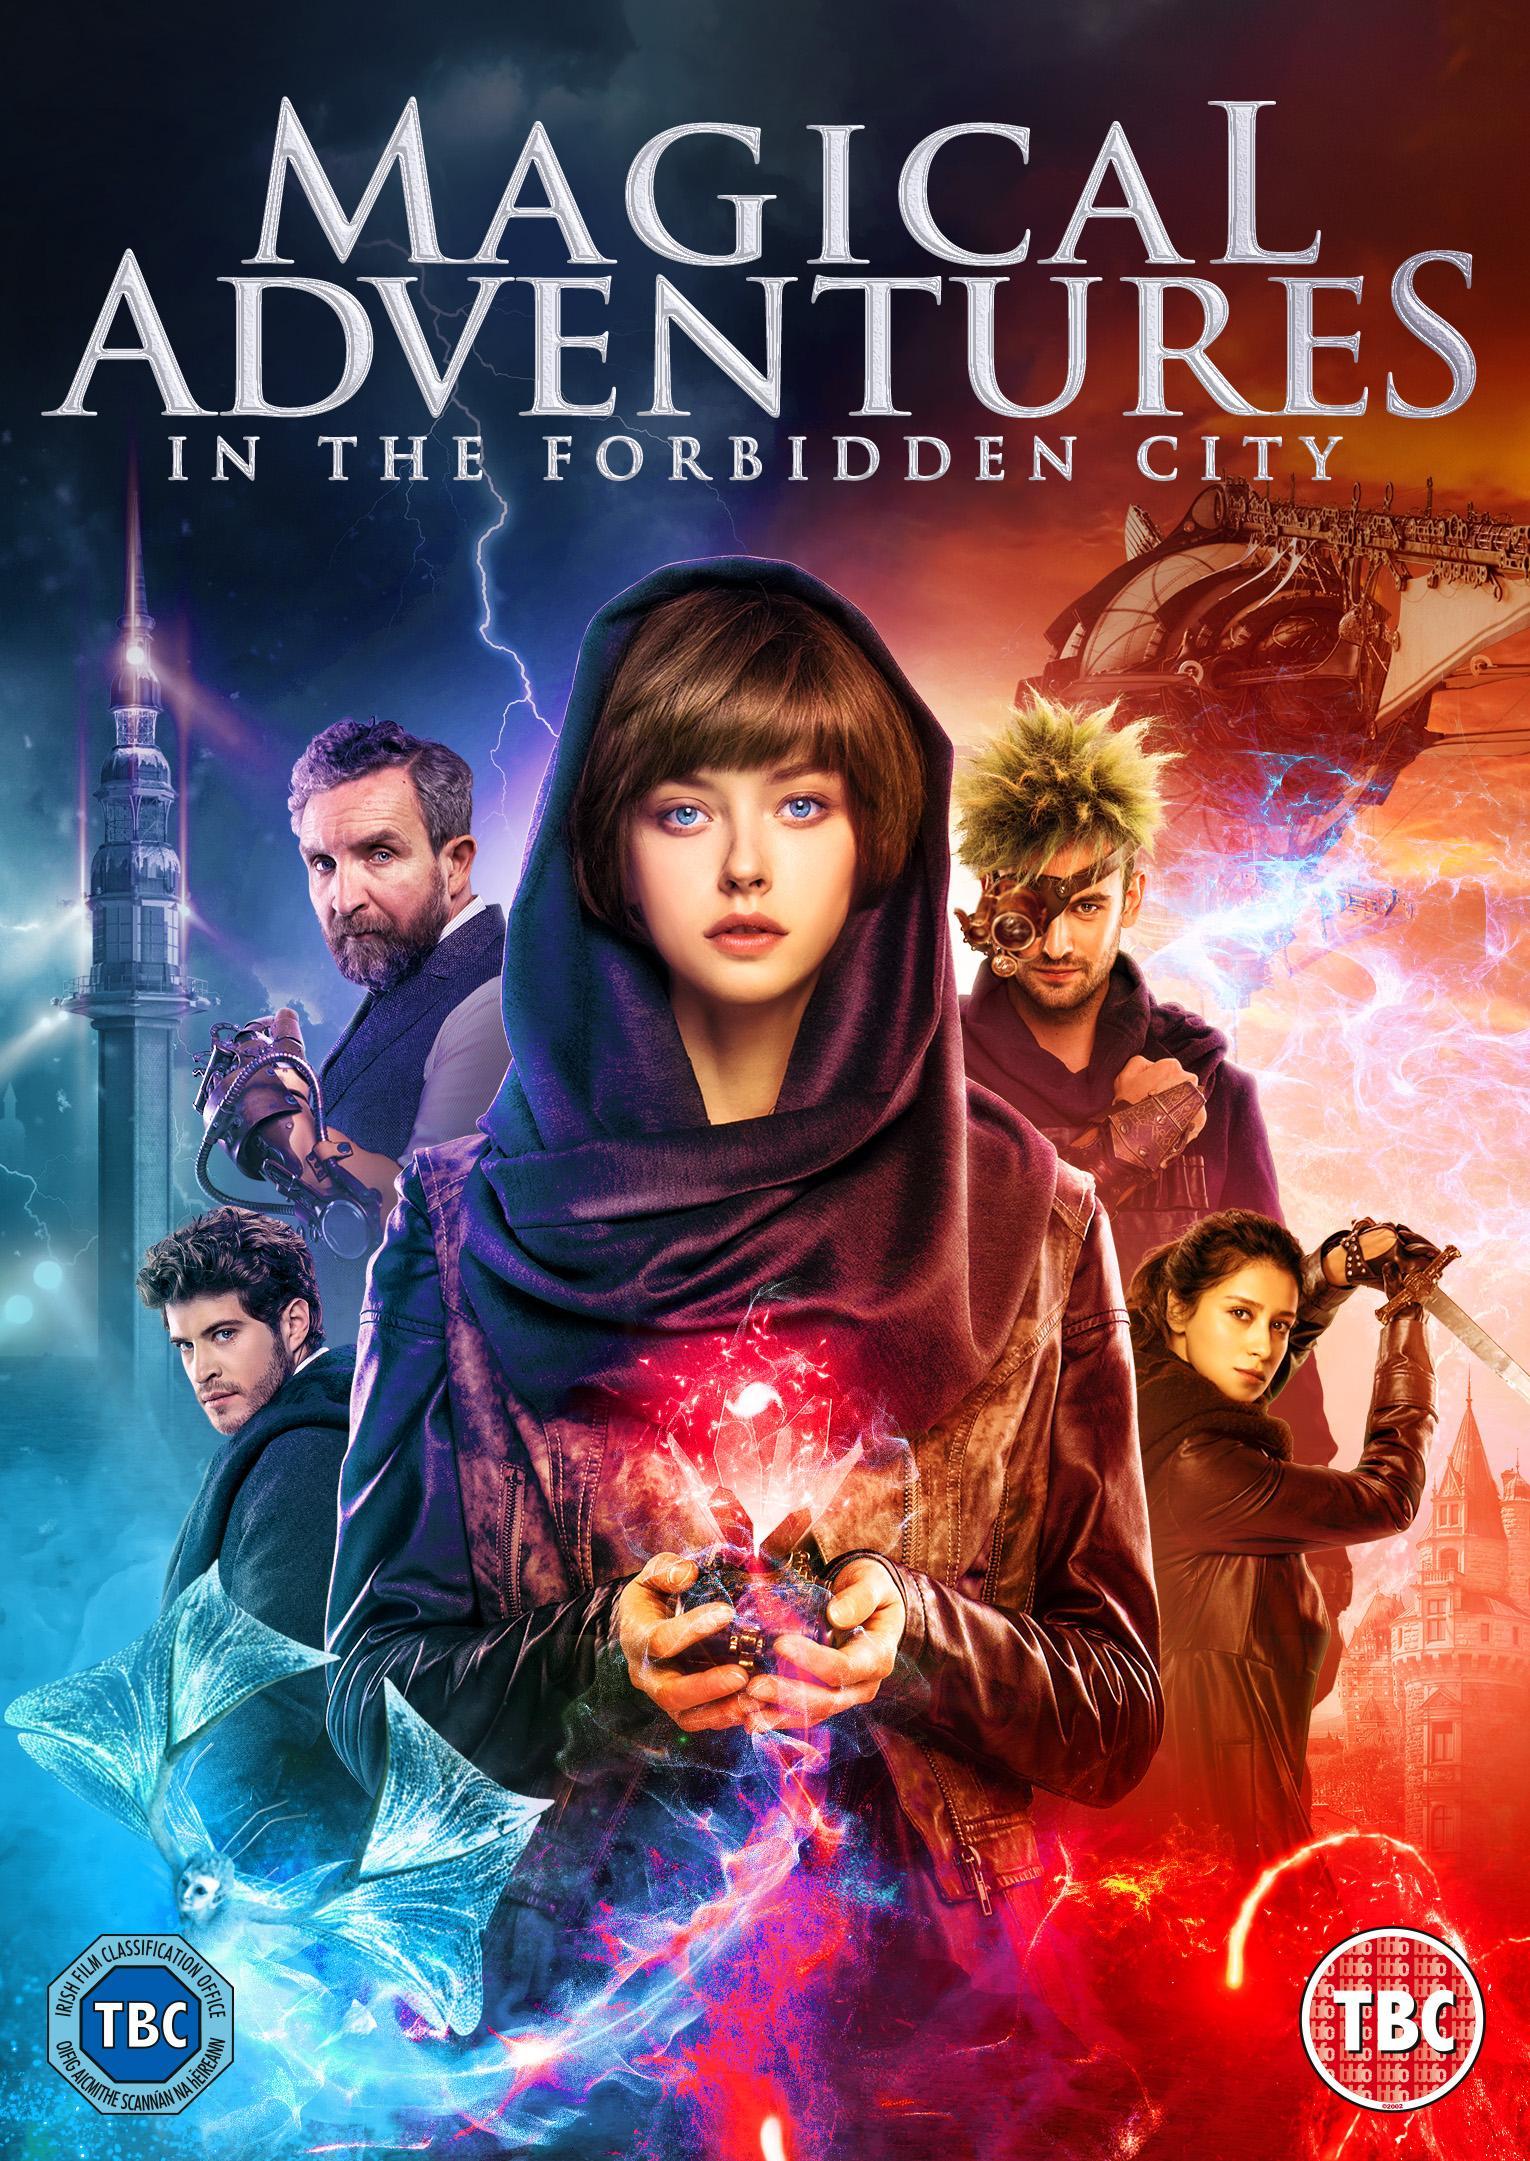 Magical adventures in the forbidden city